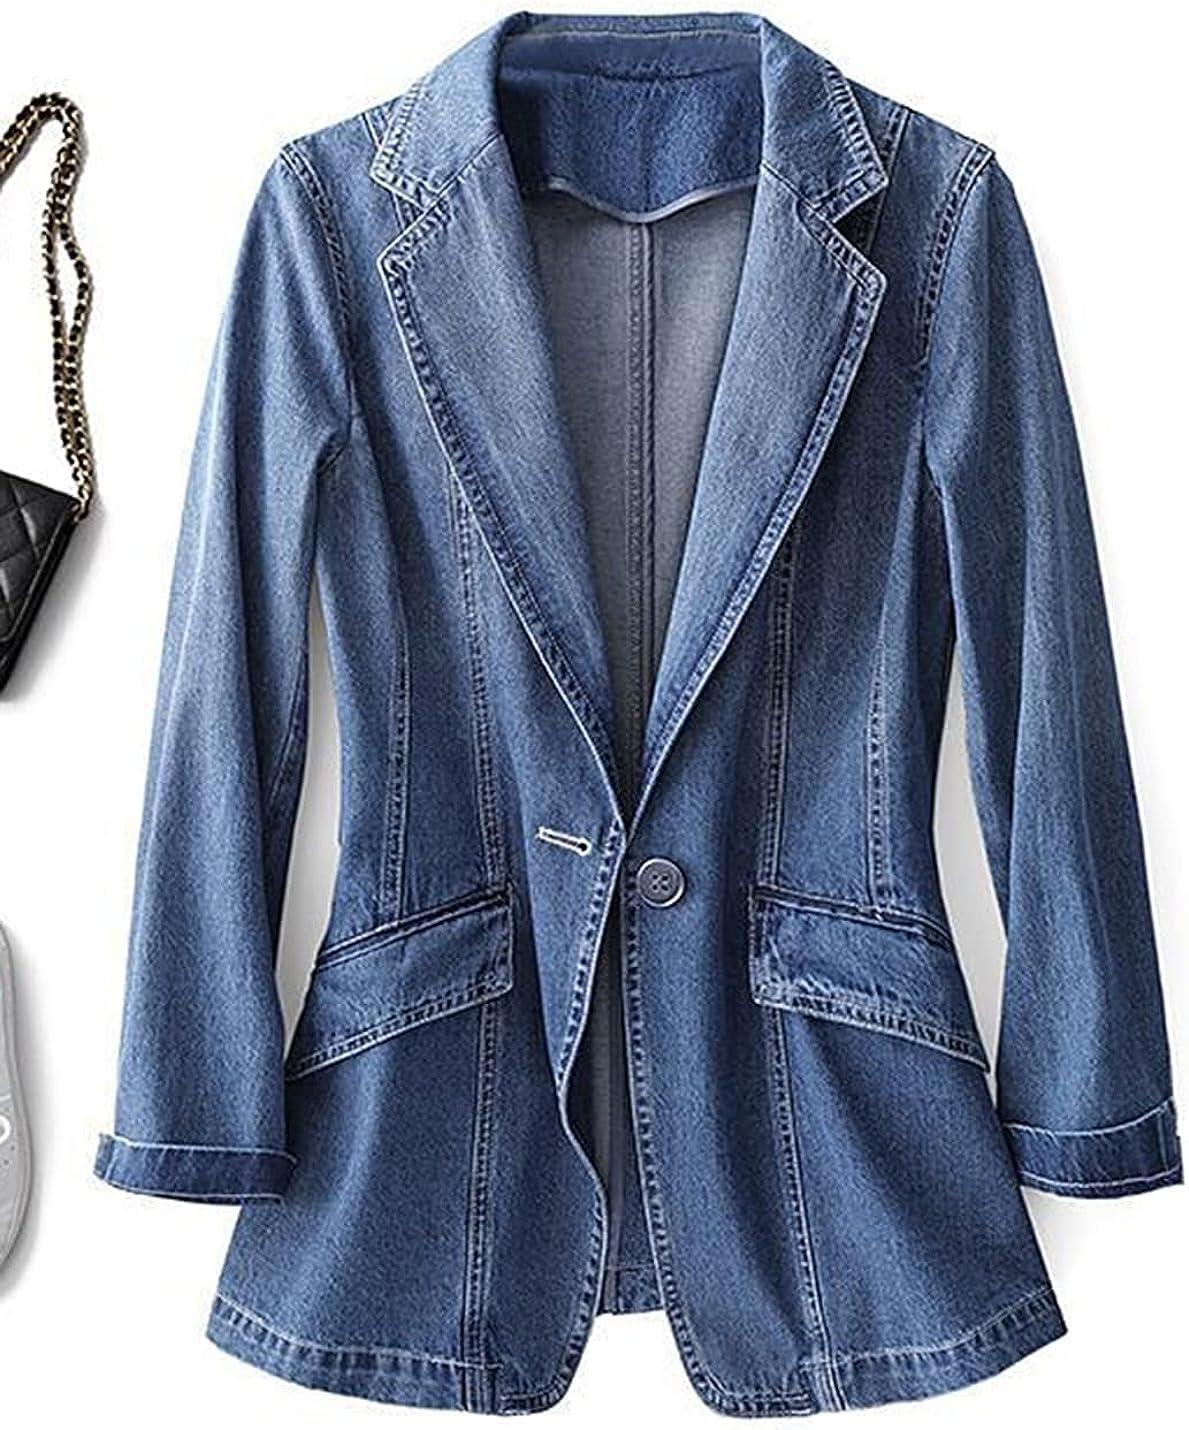 Omoone Women's Oversized Boyfriend Open Front Denim Blazer Trucker Jackets Coat